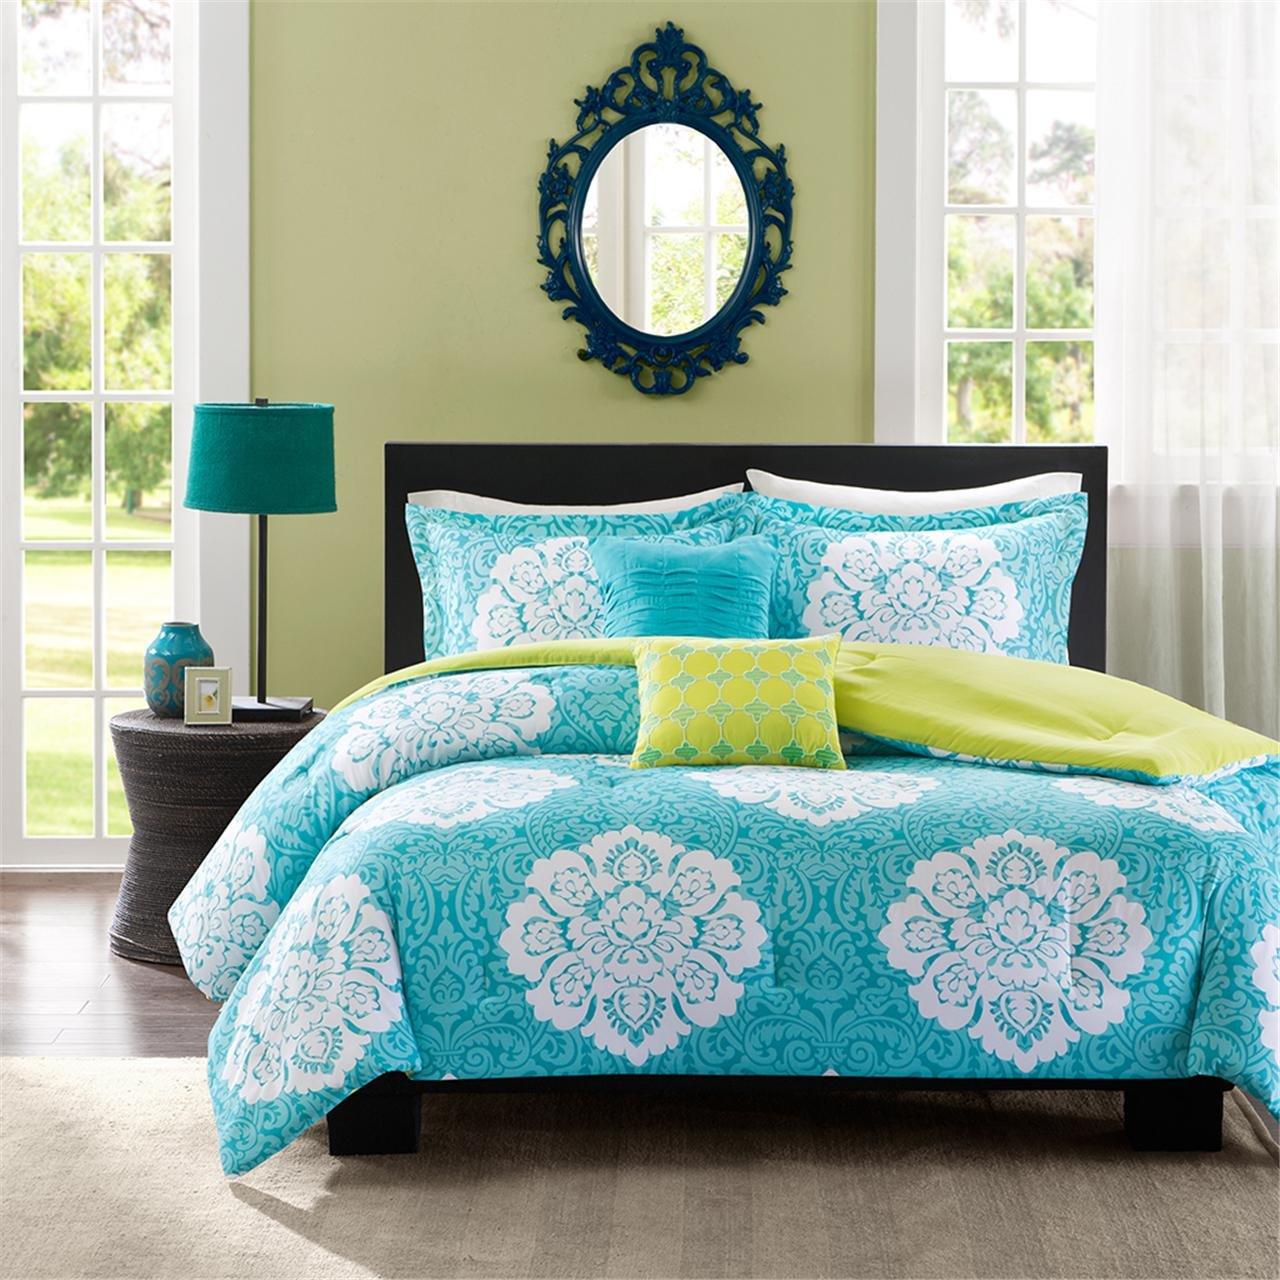 Amazon.com: Intelligent Design -Tanya -All Seasons Comforter Set -5 Piece -  Grey - Damask Pattern - Full/Queen Size - Includes 1 Comforter, 2 Shams, ... - Amazon.com: Intelligent Design -Tanya -All Seasons Comforter Set